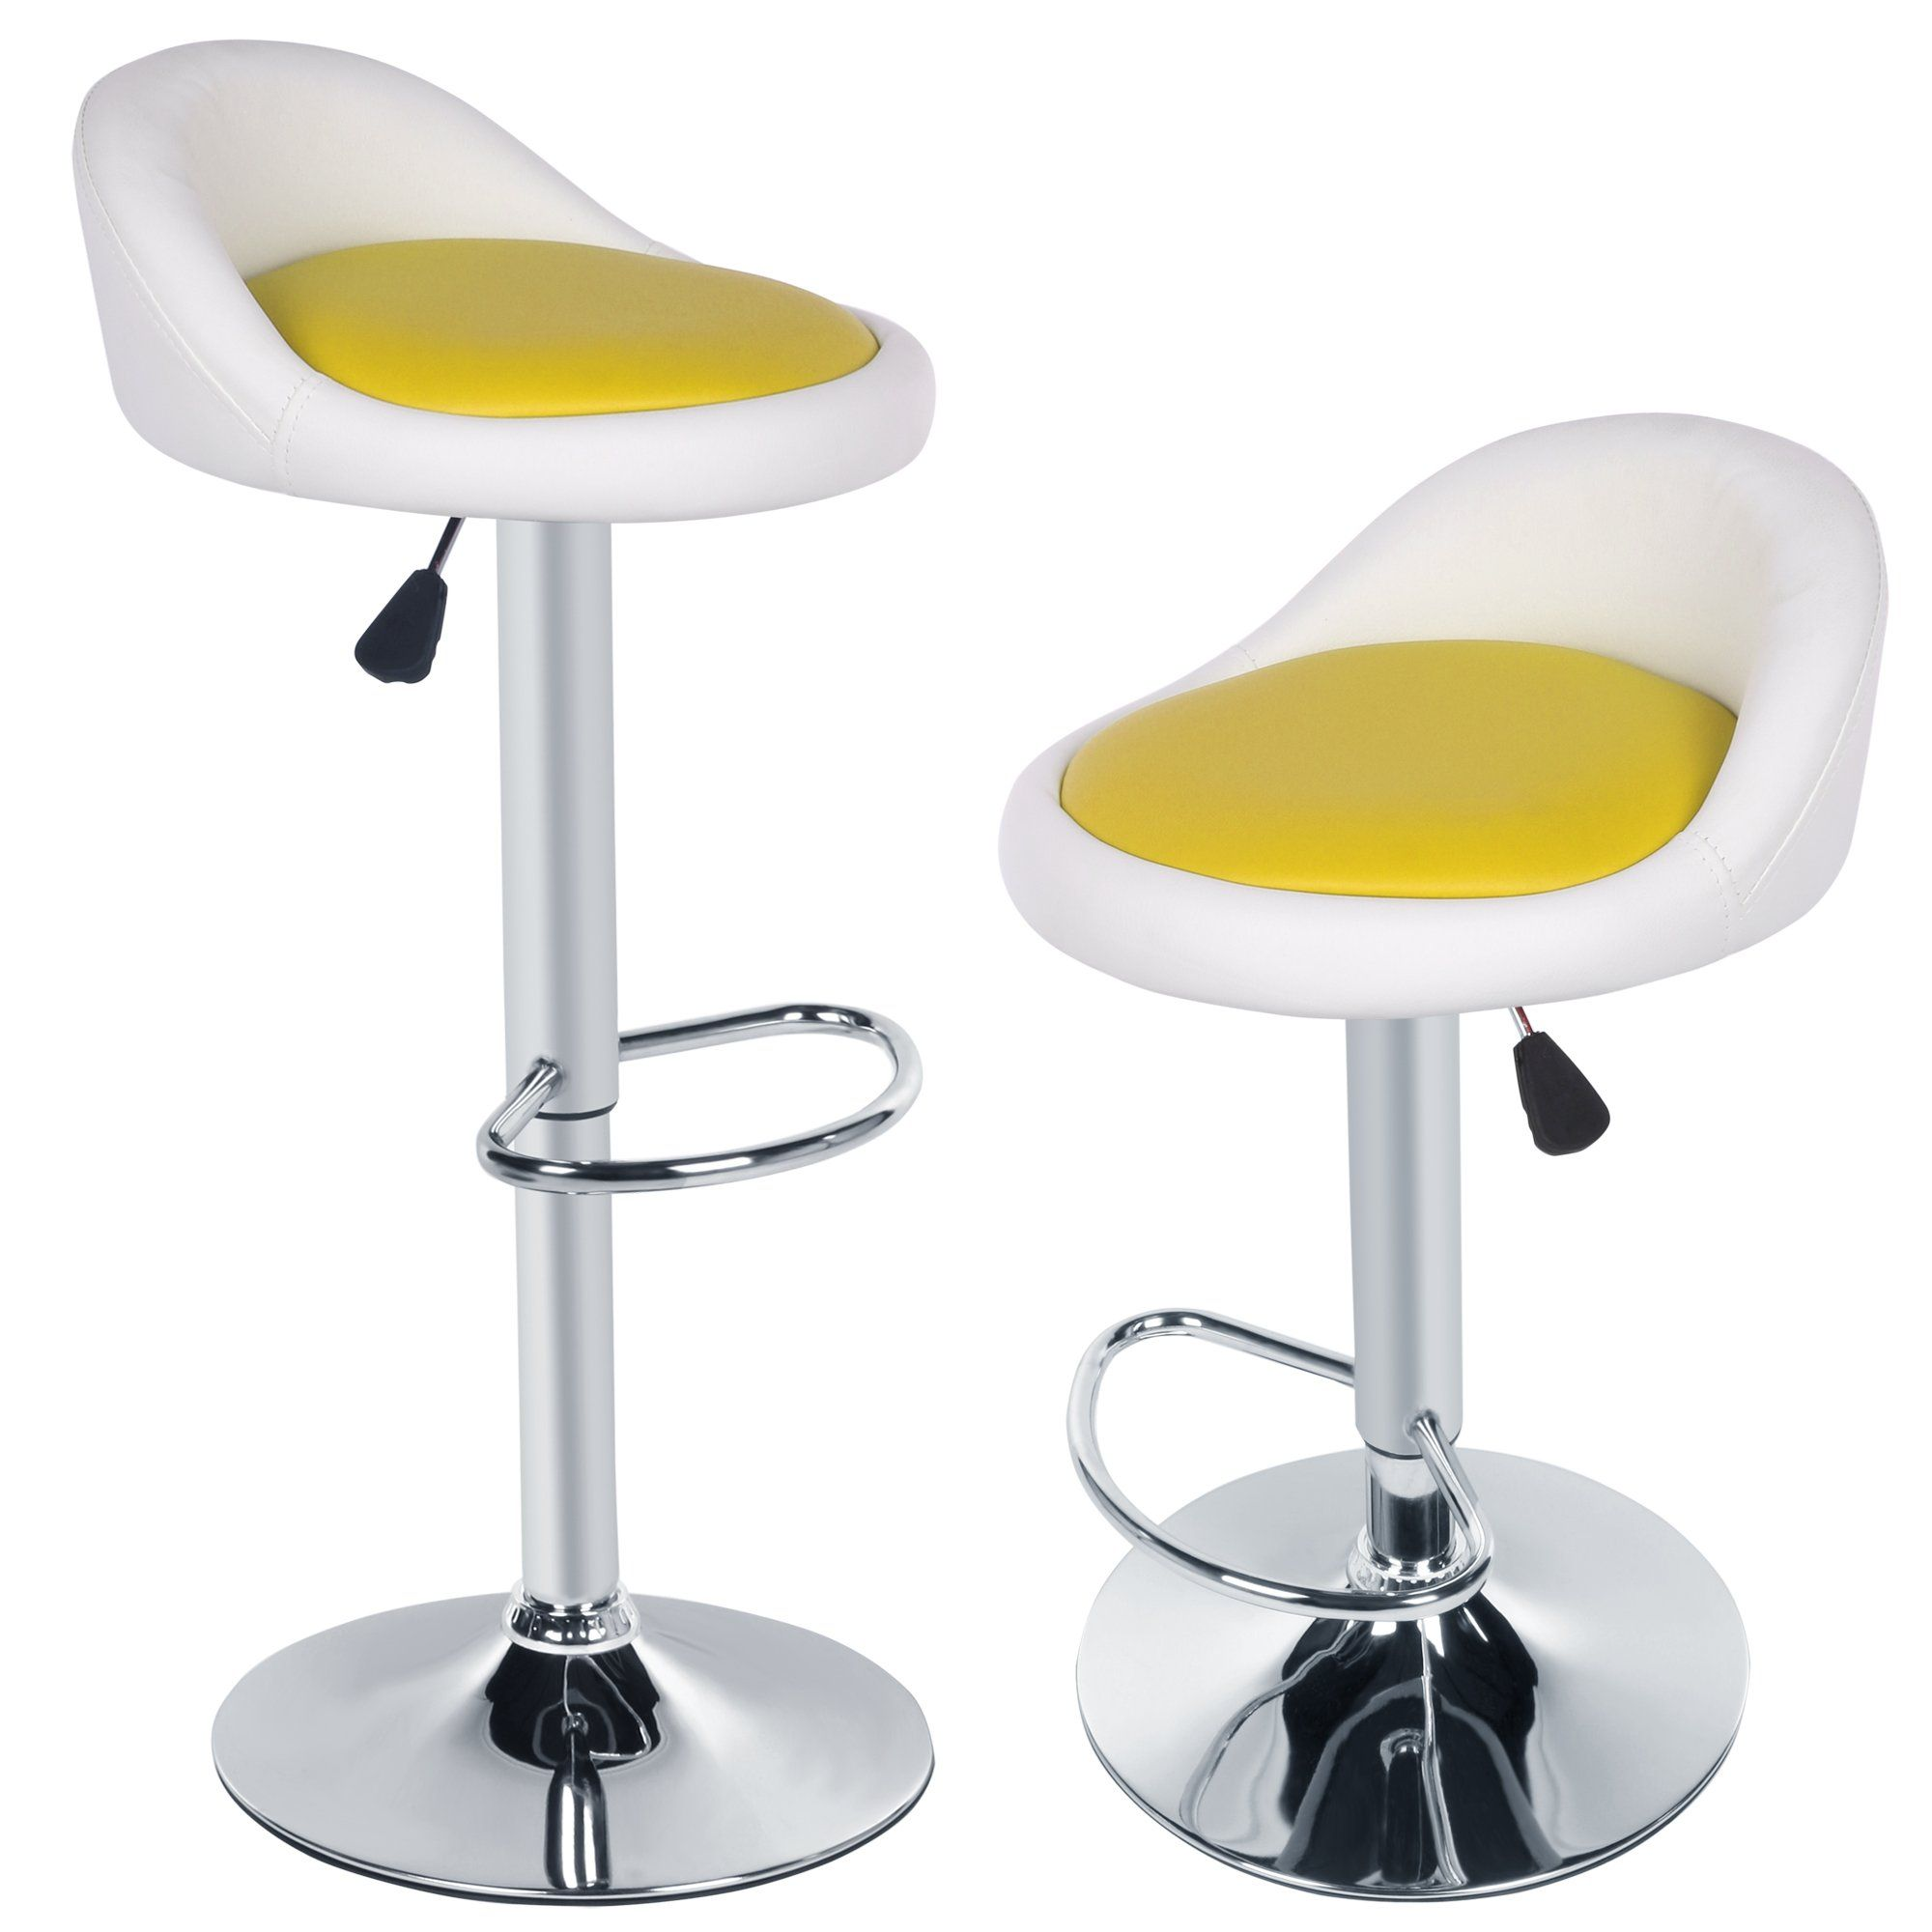 Homdox bar chairs leather adjustable swivel bar stools for